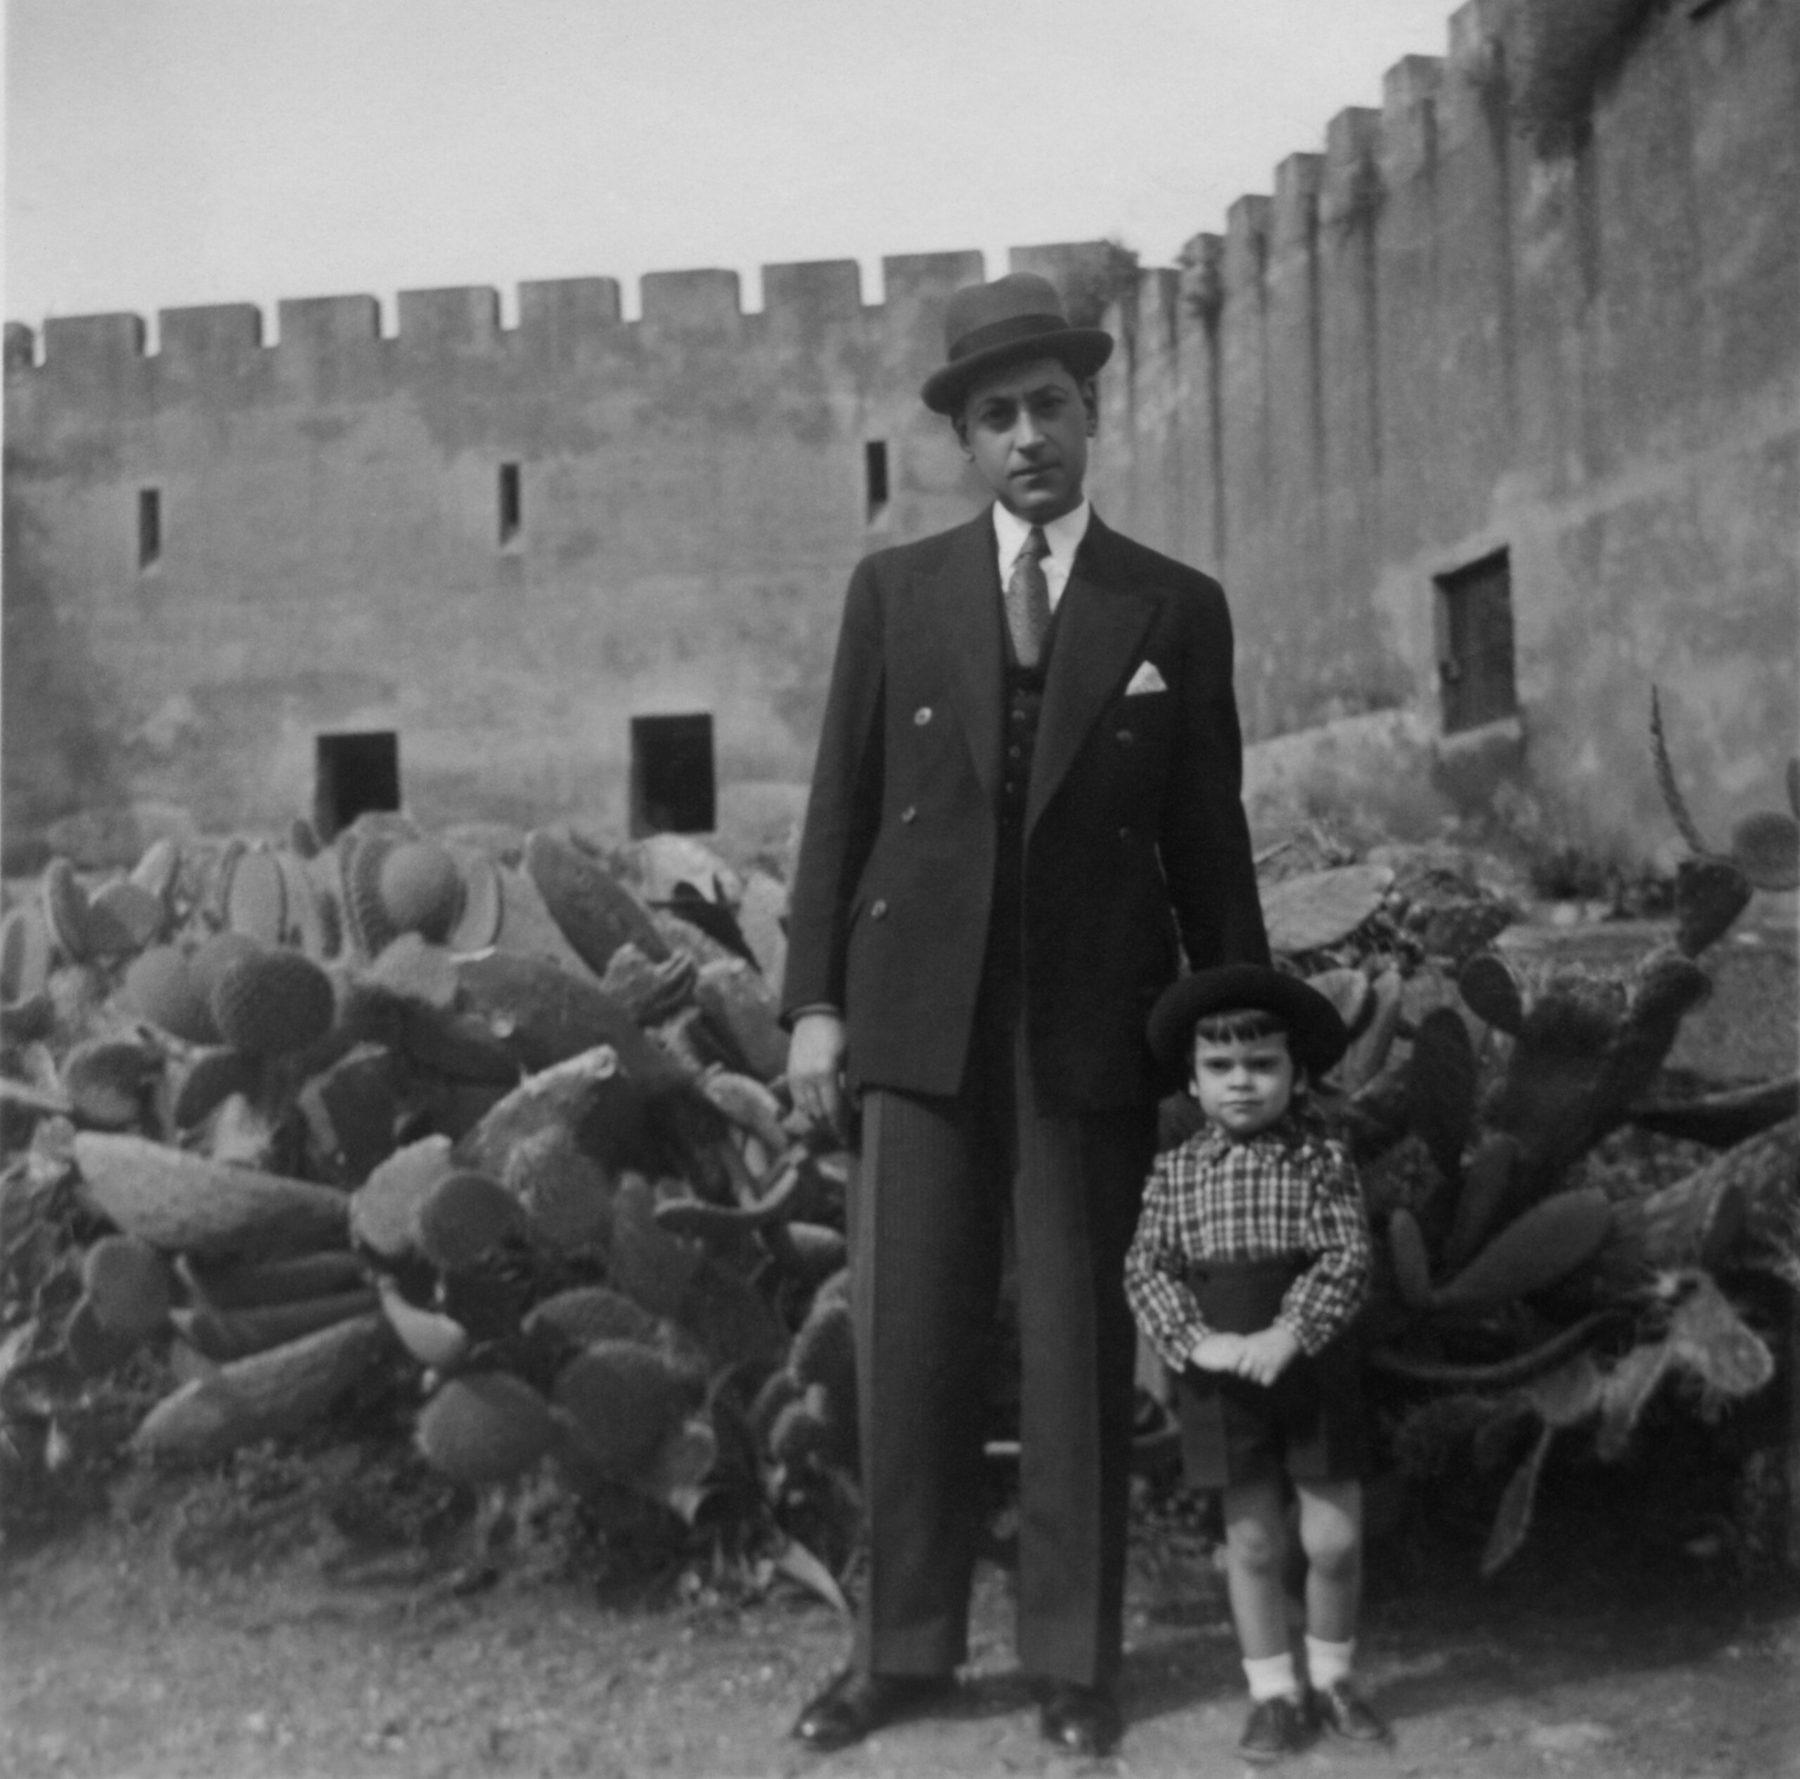 Nuno and Papa in the Castle Garden, Somewhere in Portugal, circa 1930's